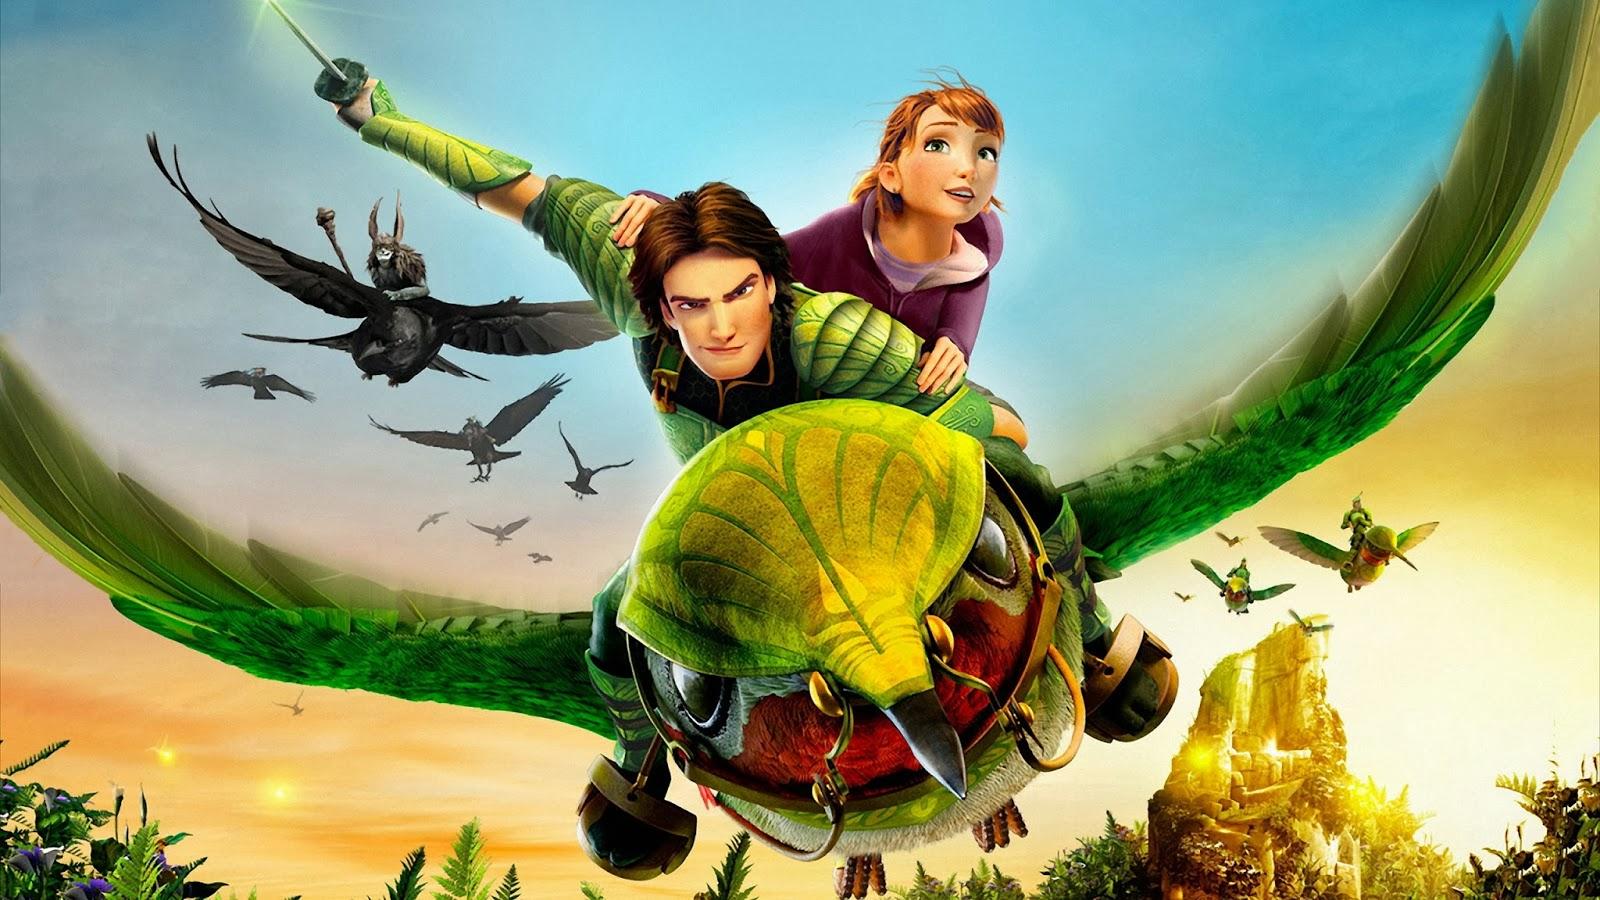 Epic 2013 animated film animatedfilmreviews.blogspot.com